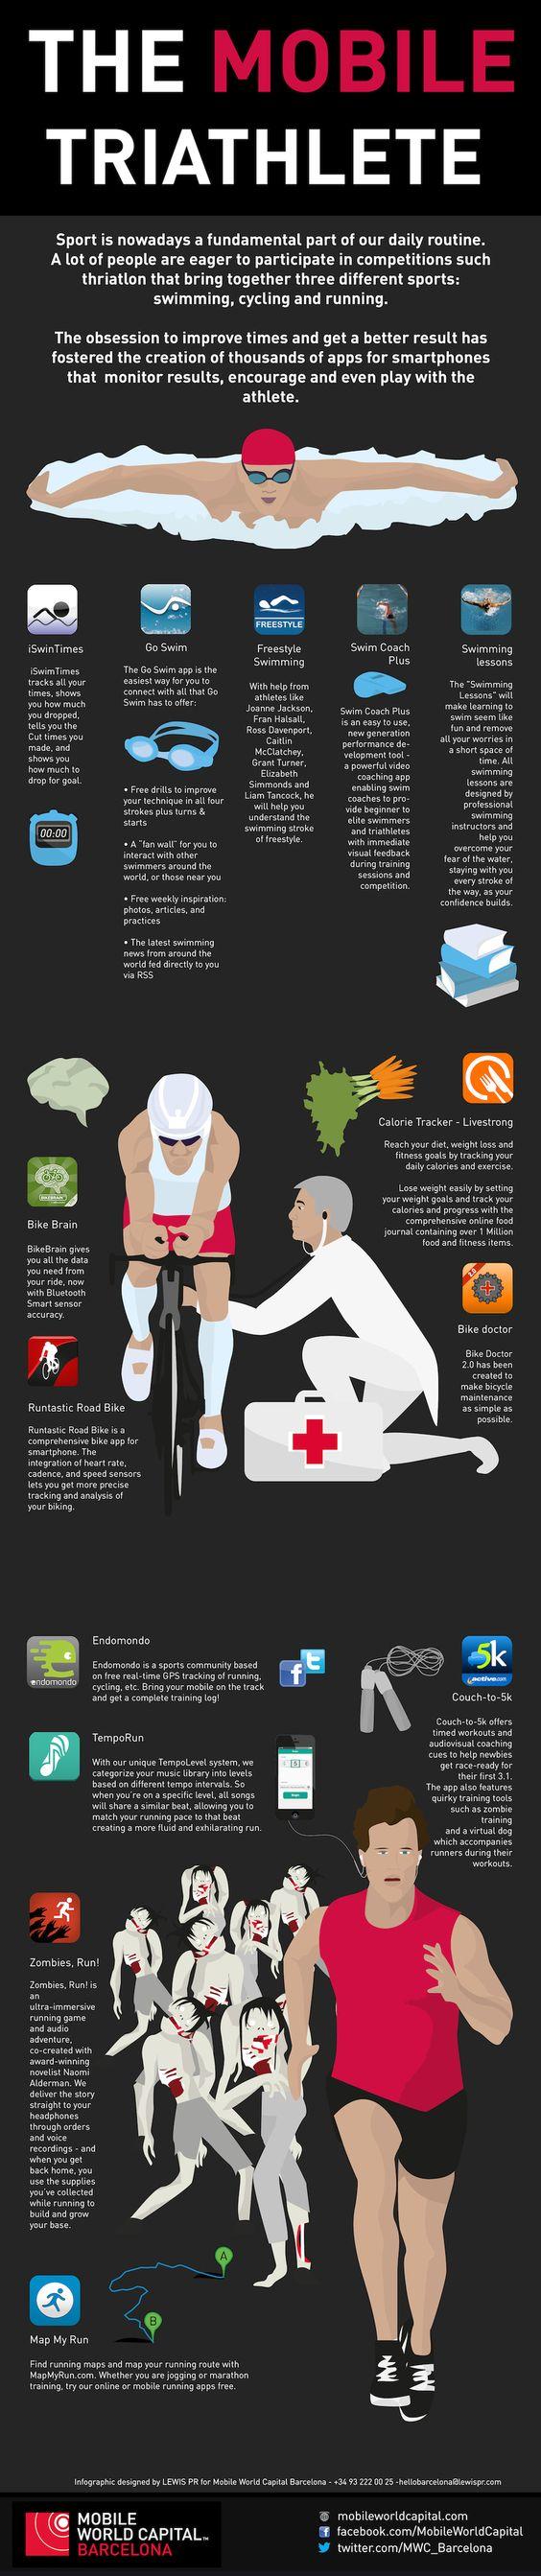 El triatleta móvil | Mobile World Capital #mobilemarketing #apps